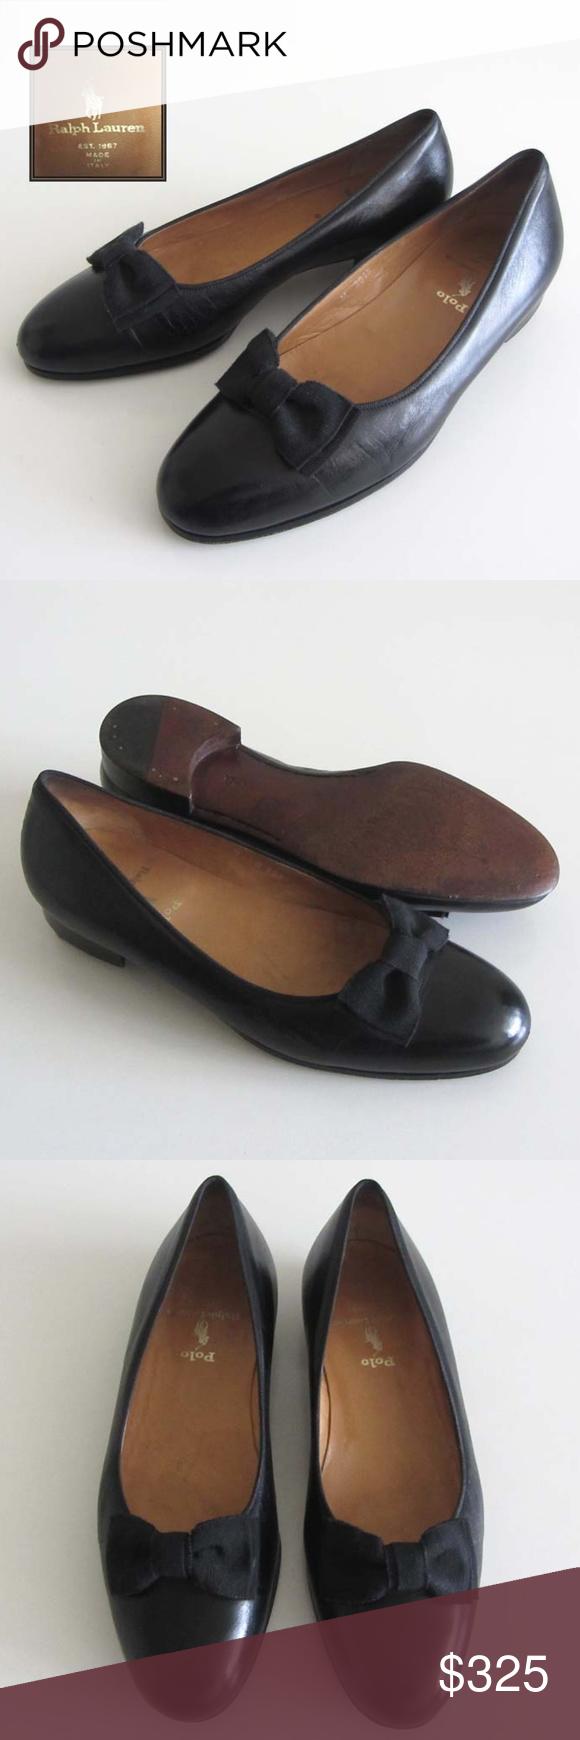 POLO RALPH LAUREN tuxedo shoes 9 opera